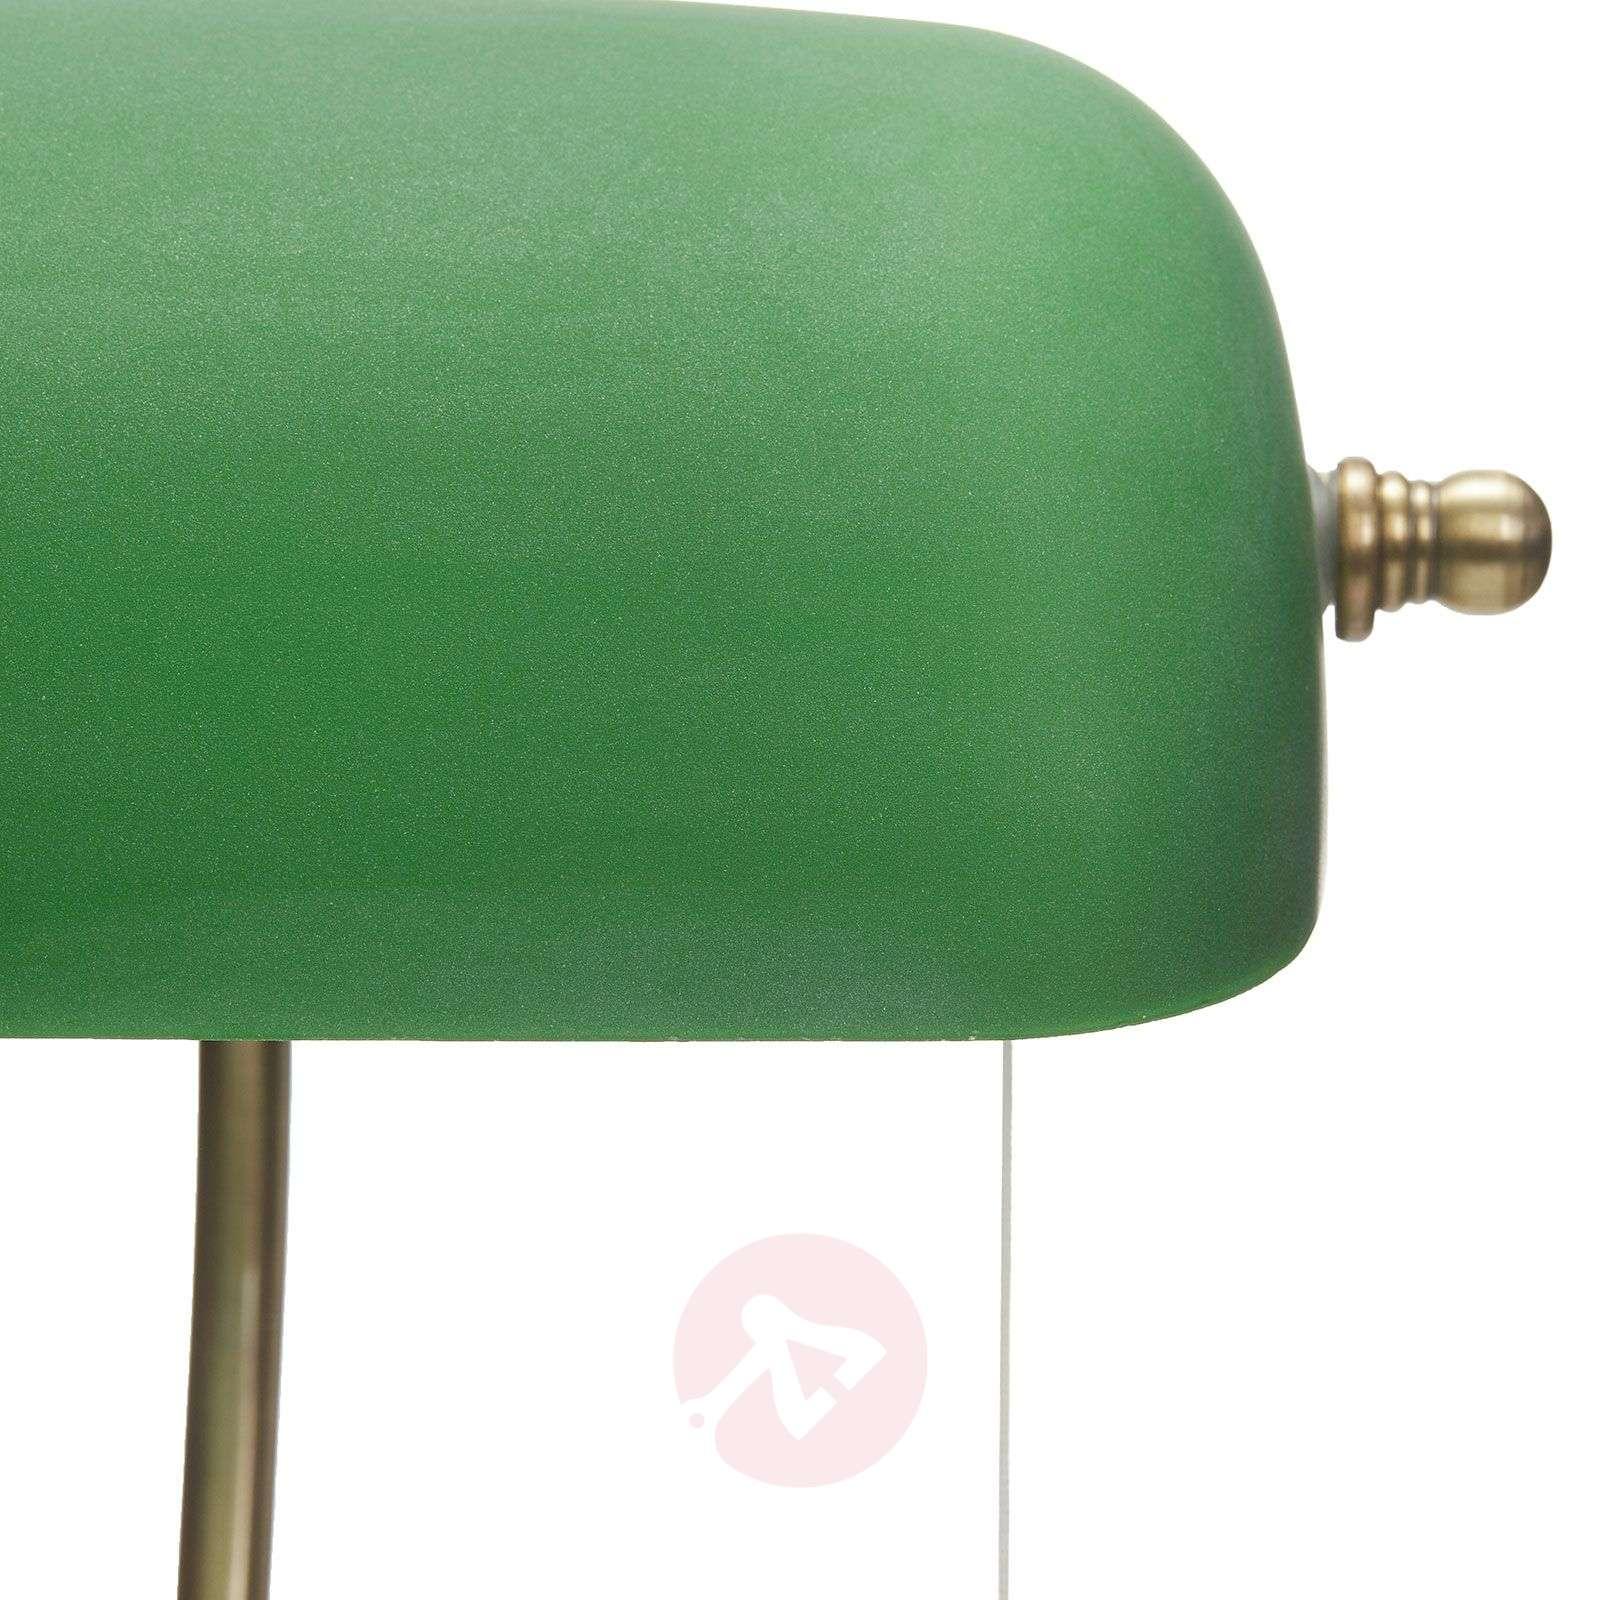 Milenka desk lamp with green lampshade-9620986-03